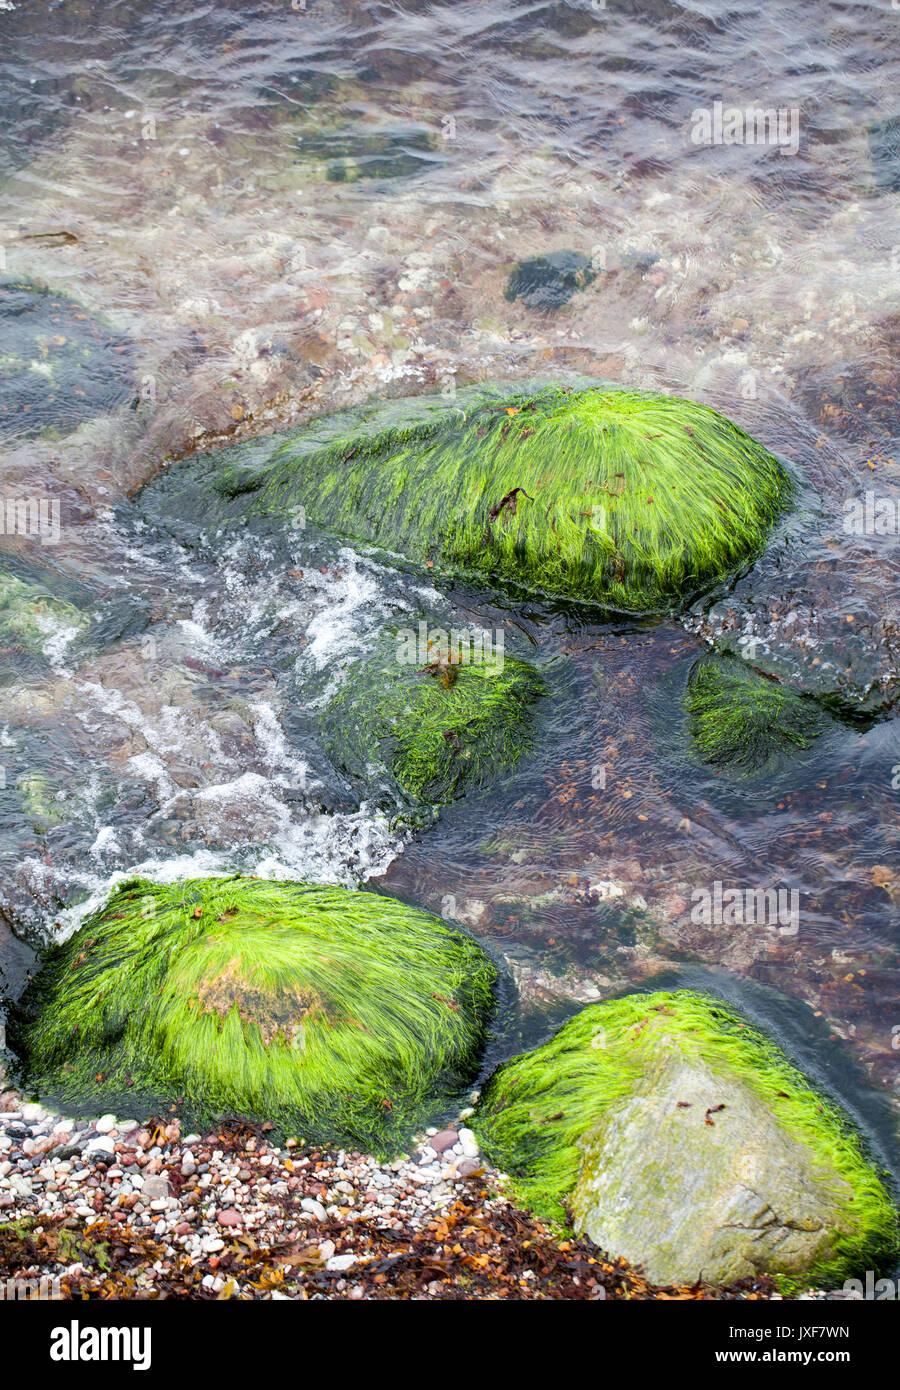 Cladophora glomereta Green algae - Stock Image